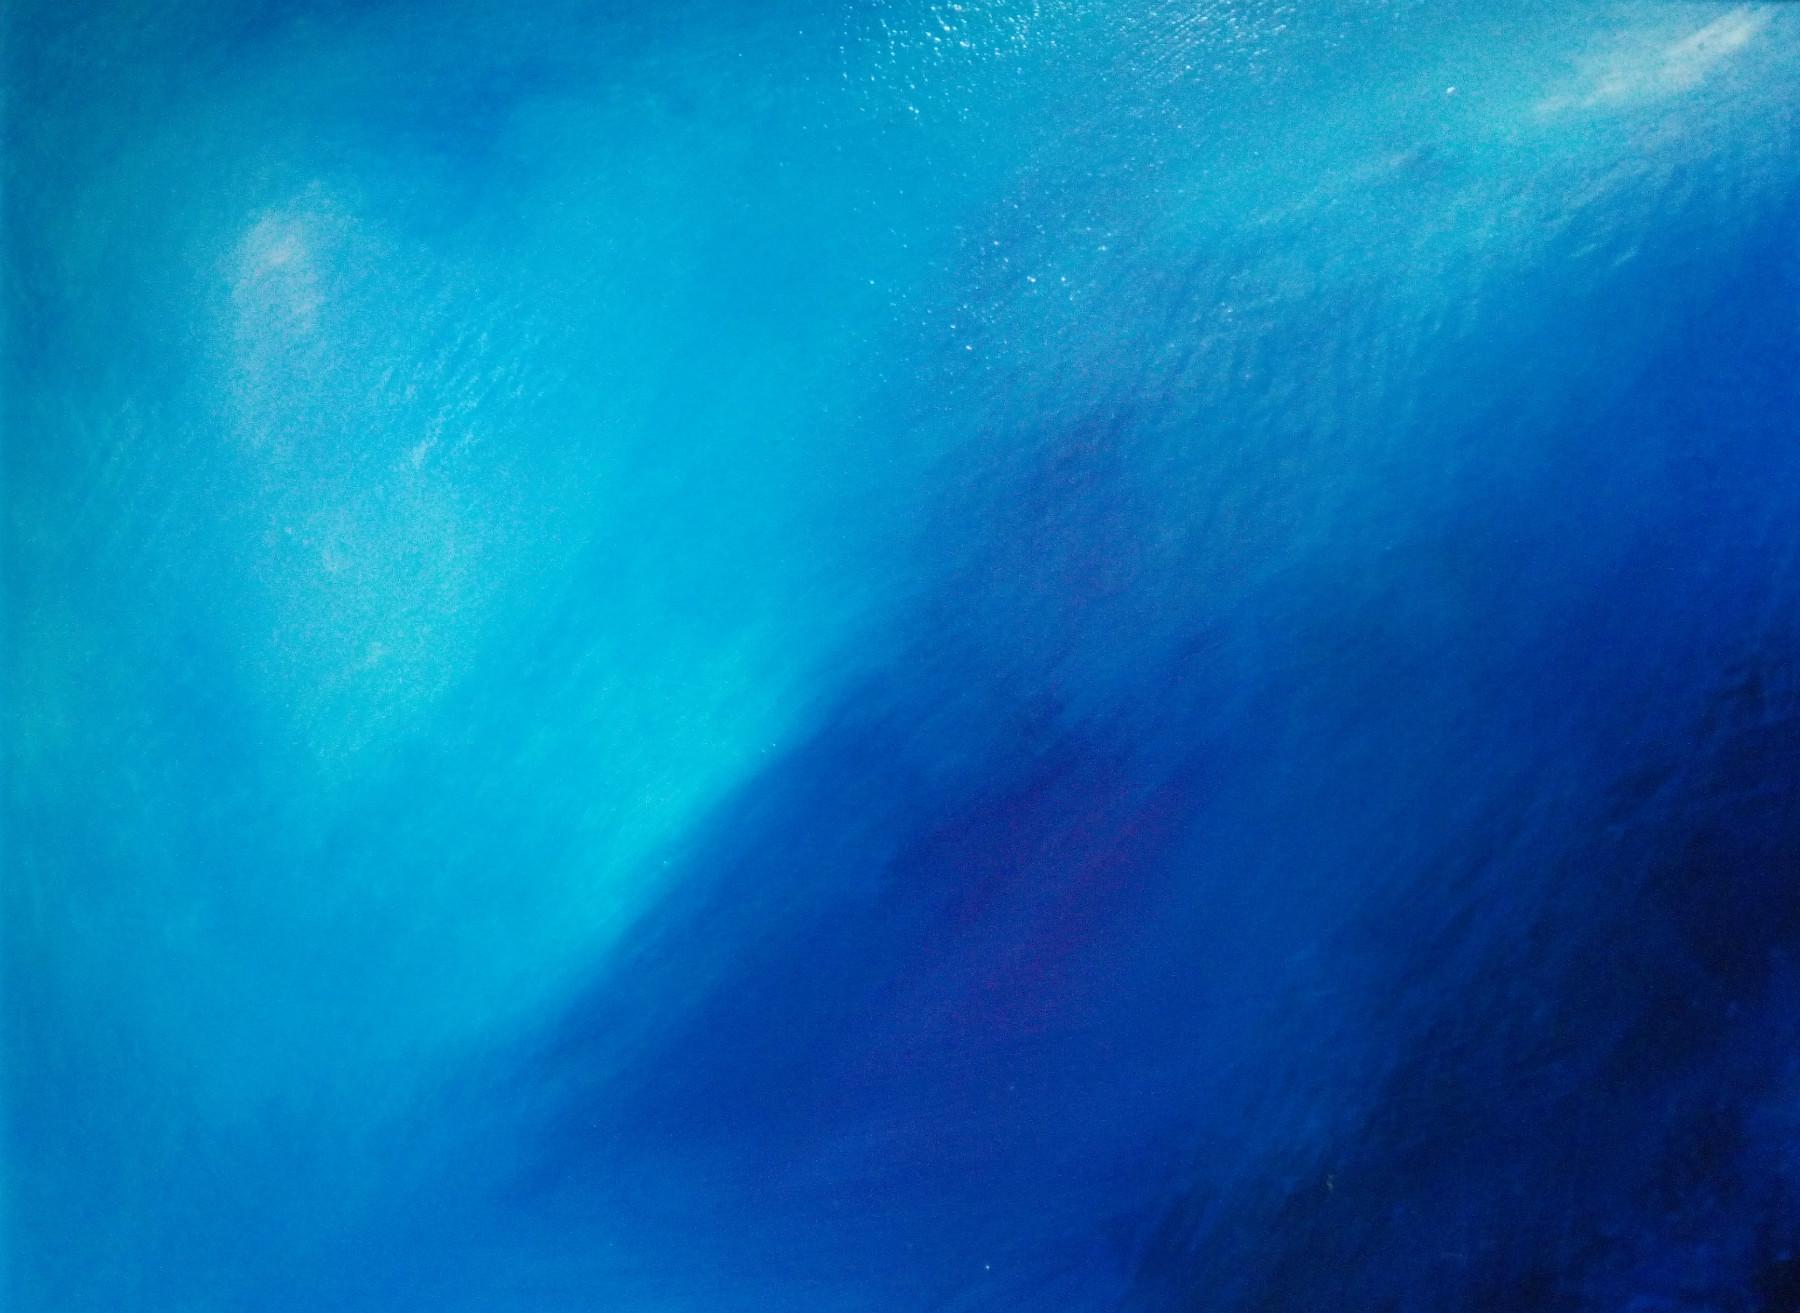 """Liebe"" - Acryl auf Malpappe ohne Rahmen, 40x30 cm"